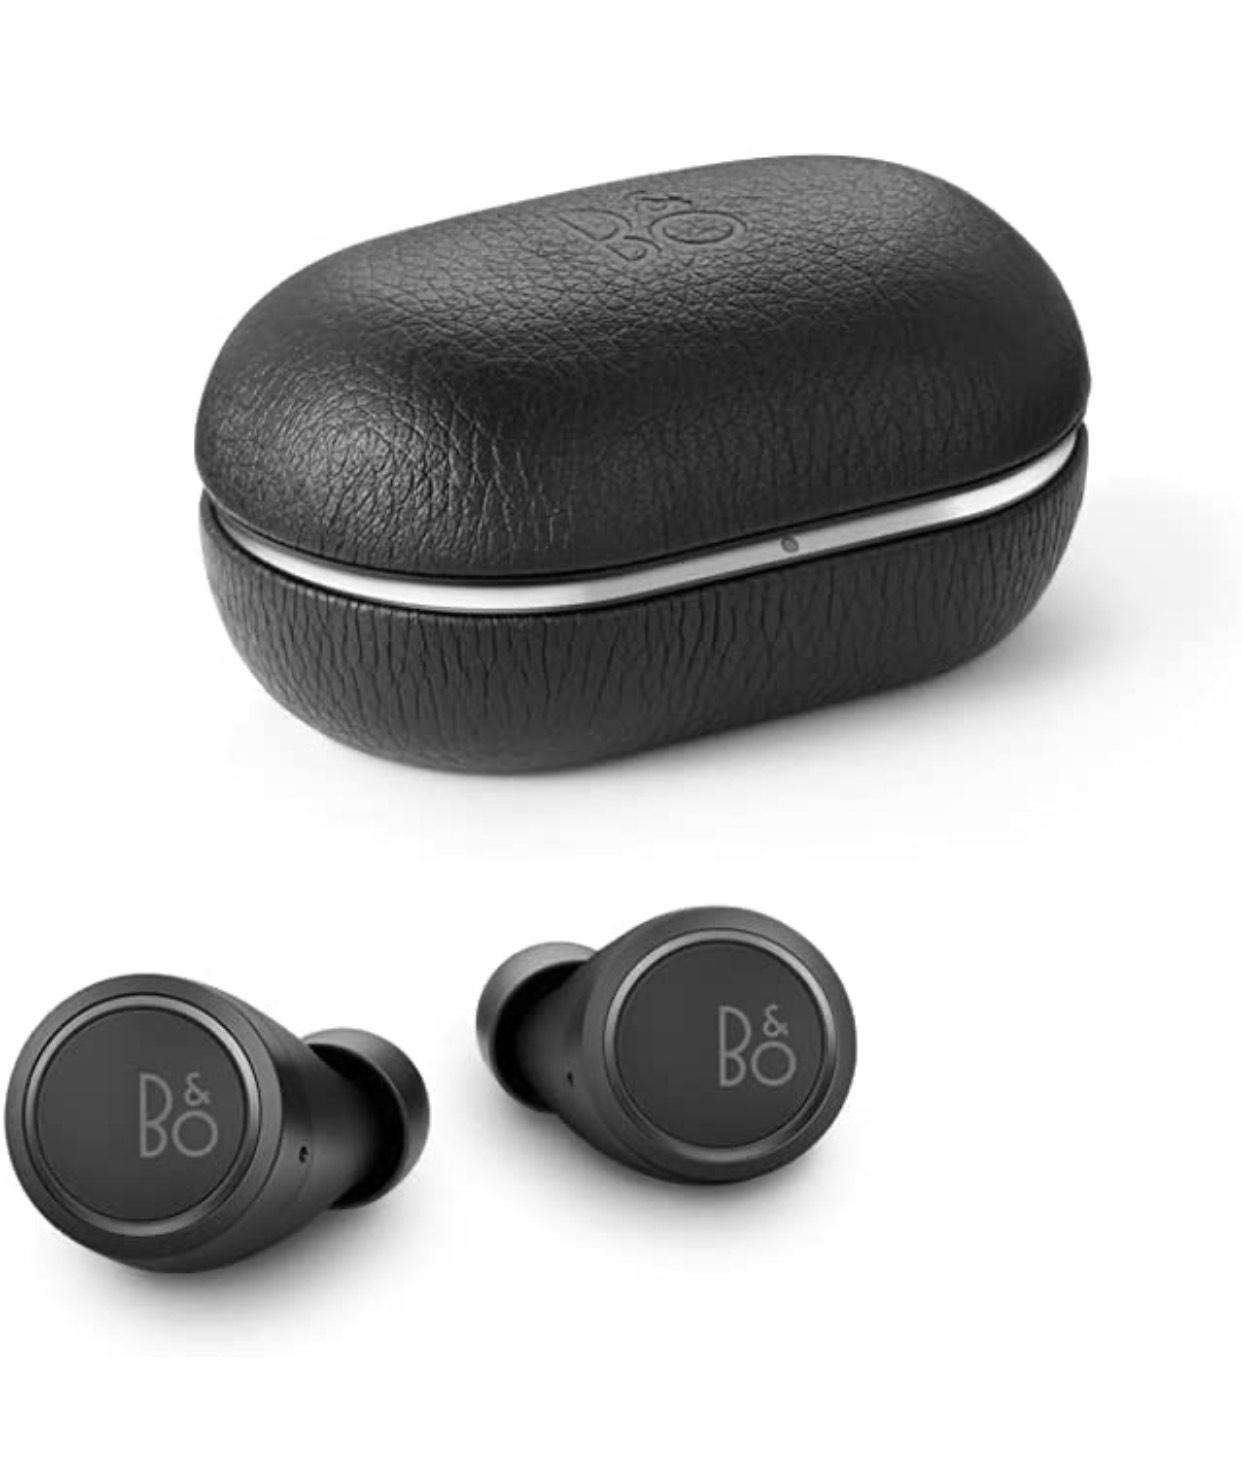 [Prime Day] Bang & Olufsen Beoplay E8 (3rd Gen) – In-Ear-Kopfhörer